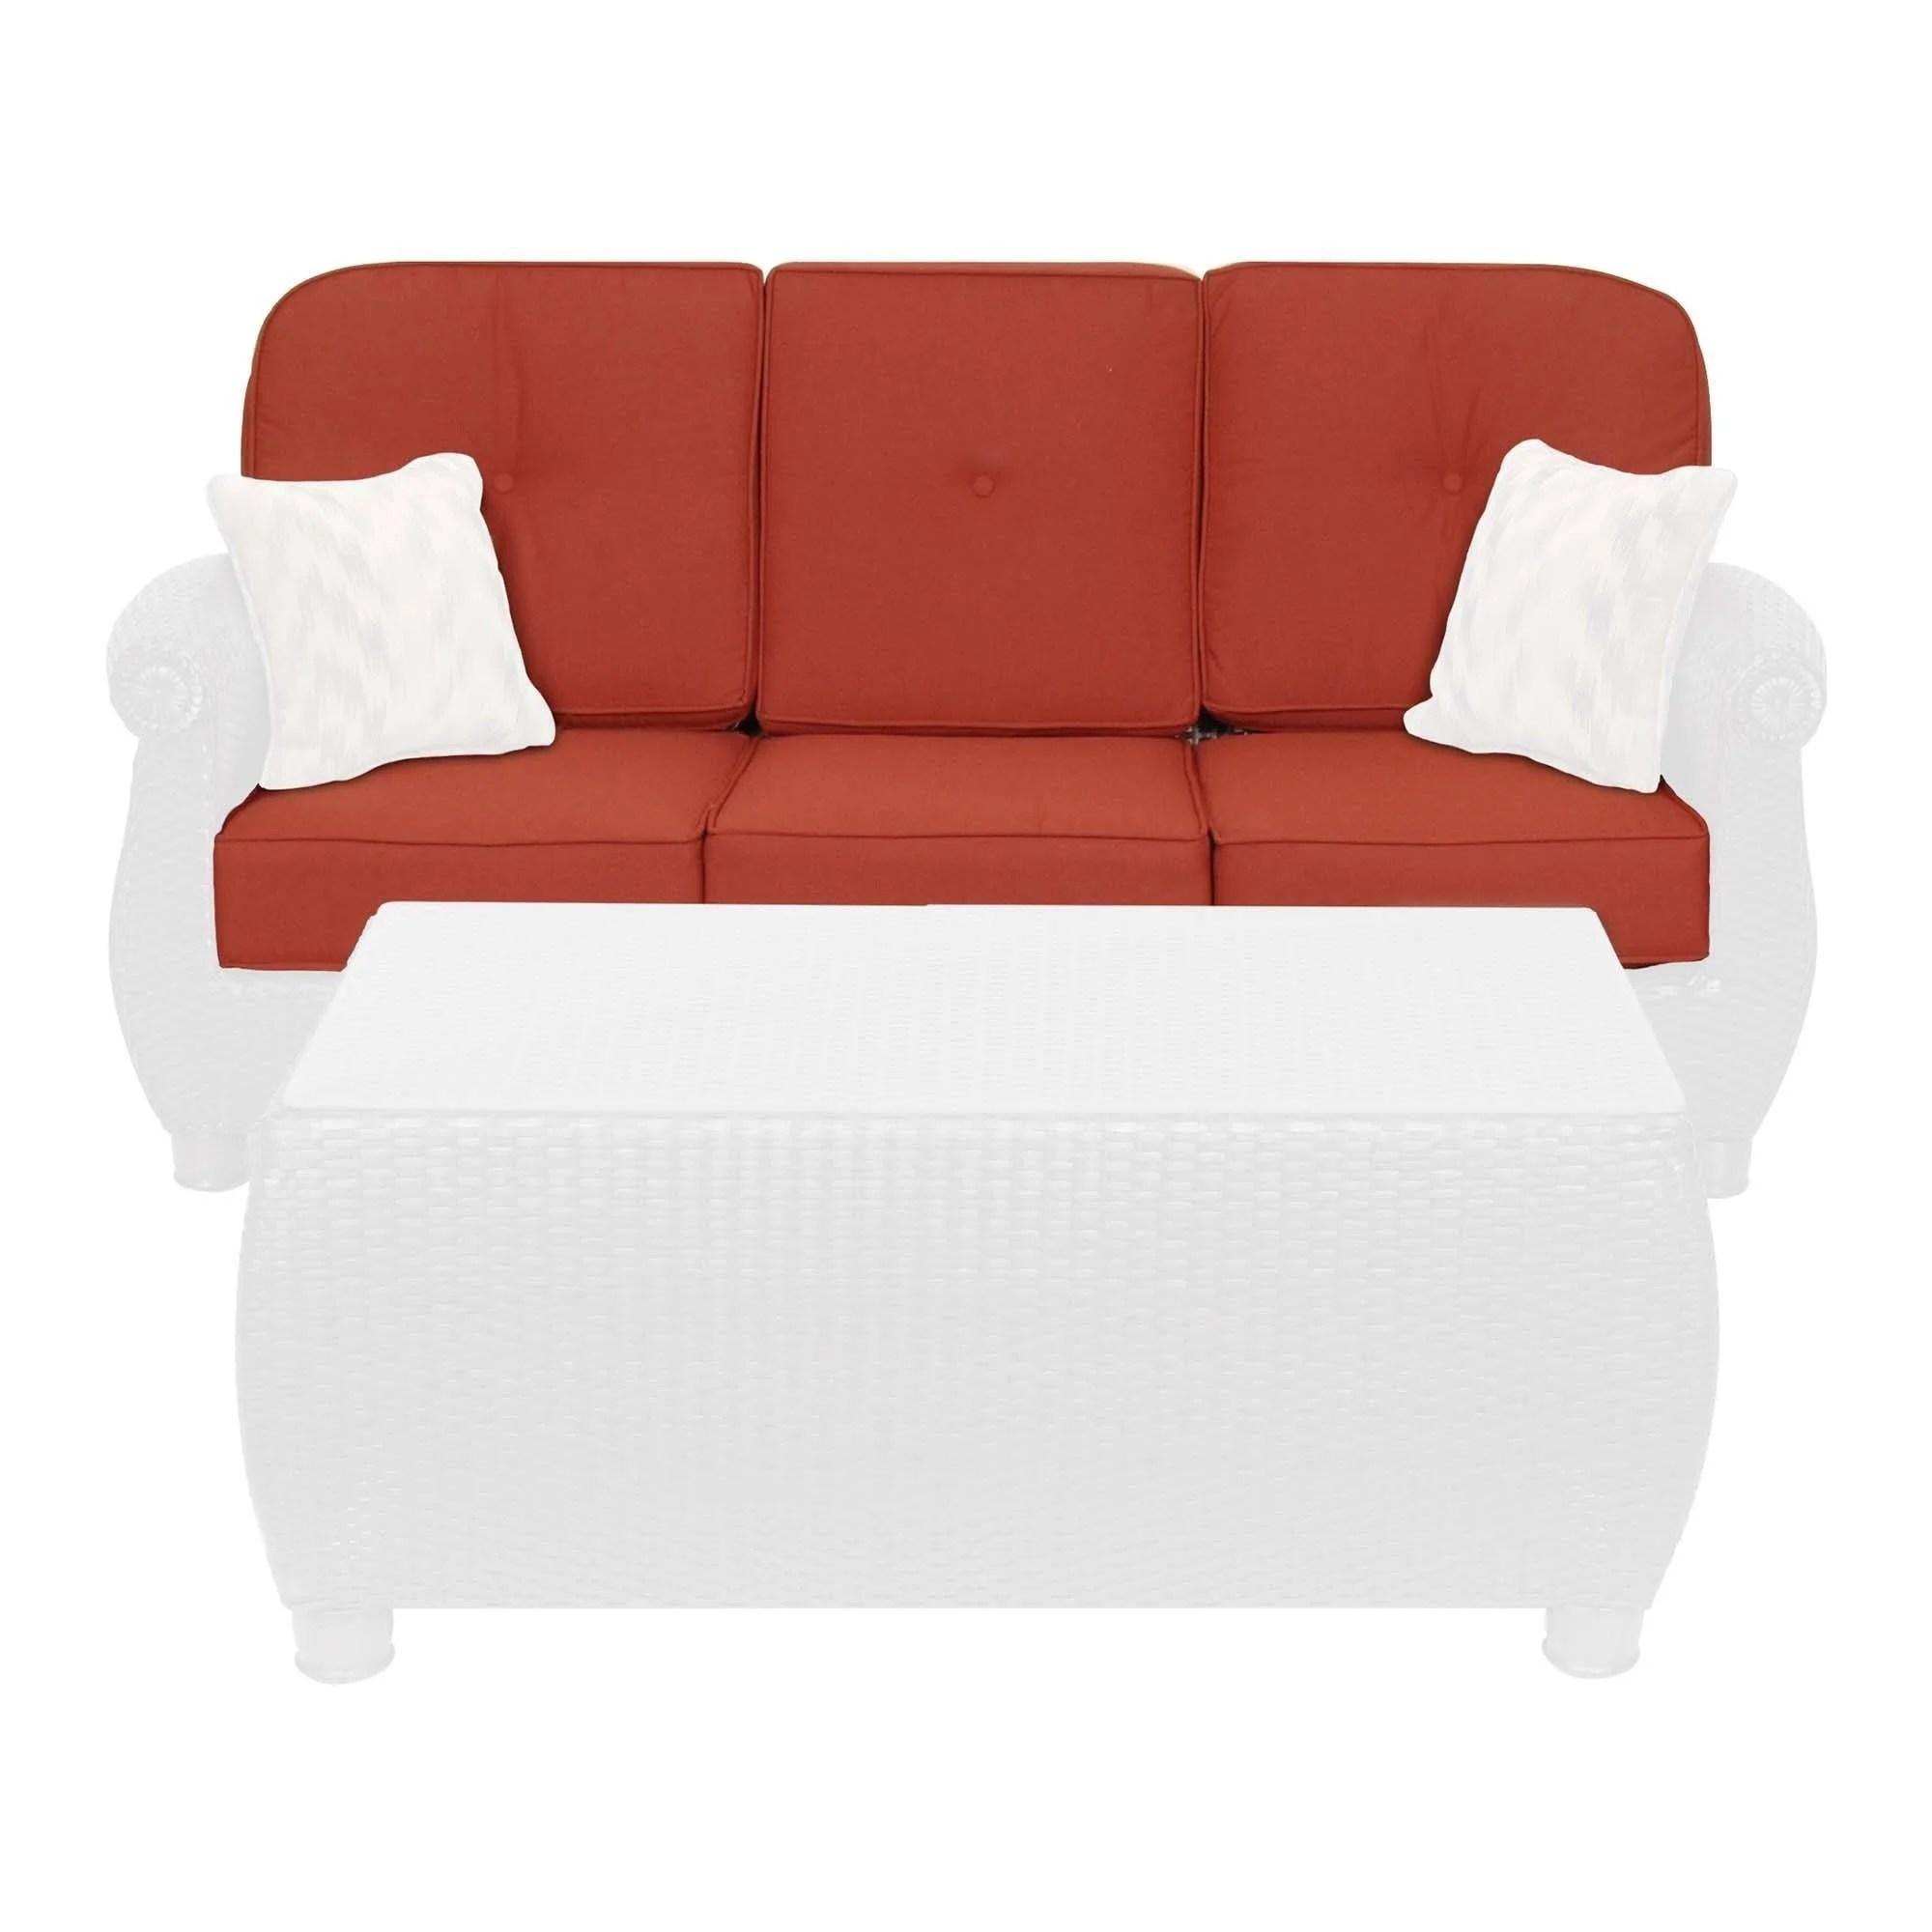 breckenridge outdoor sofa replacement cushion set